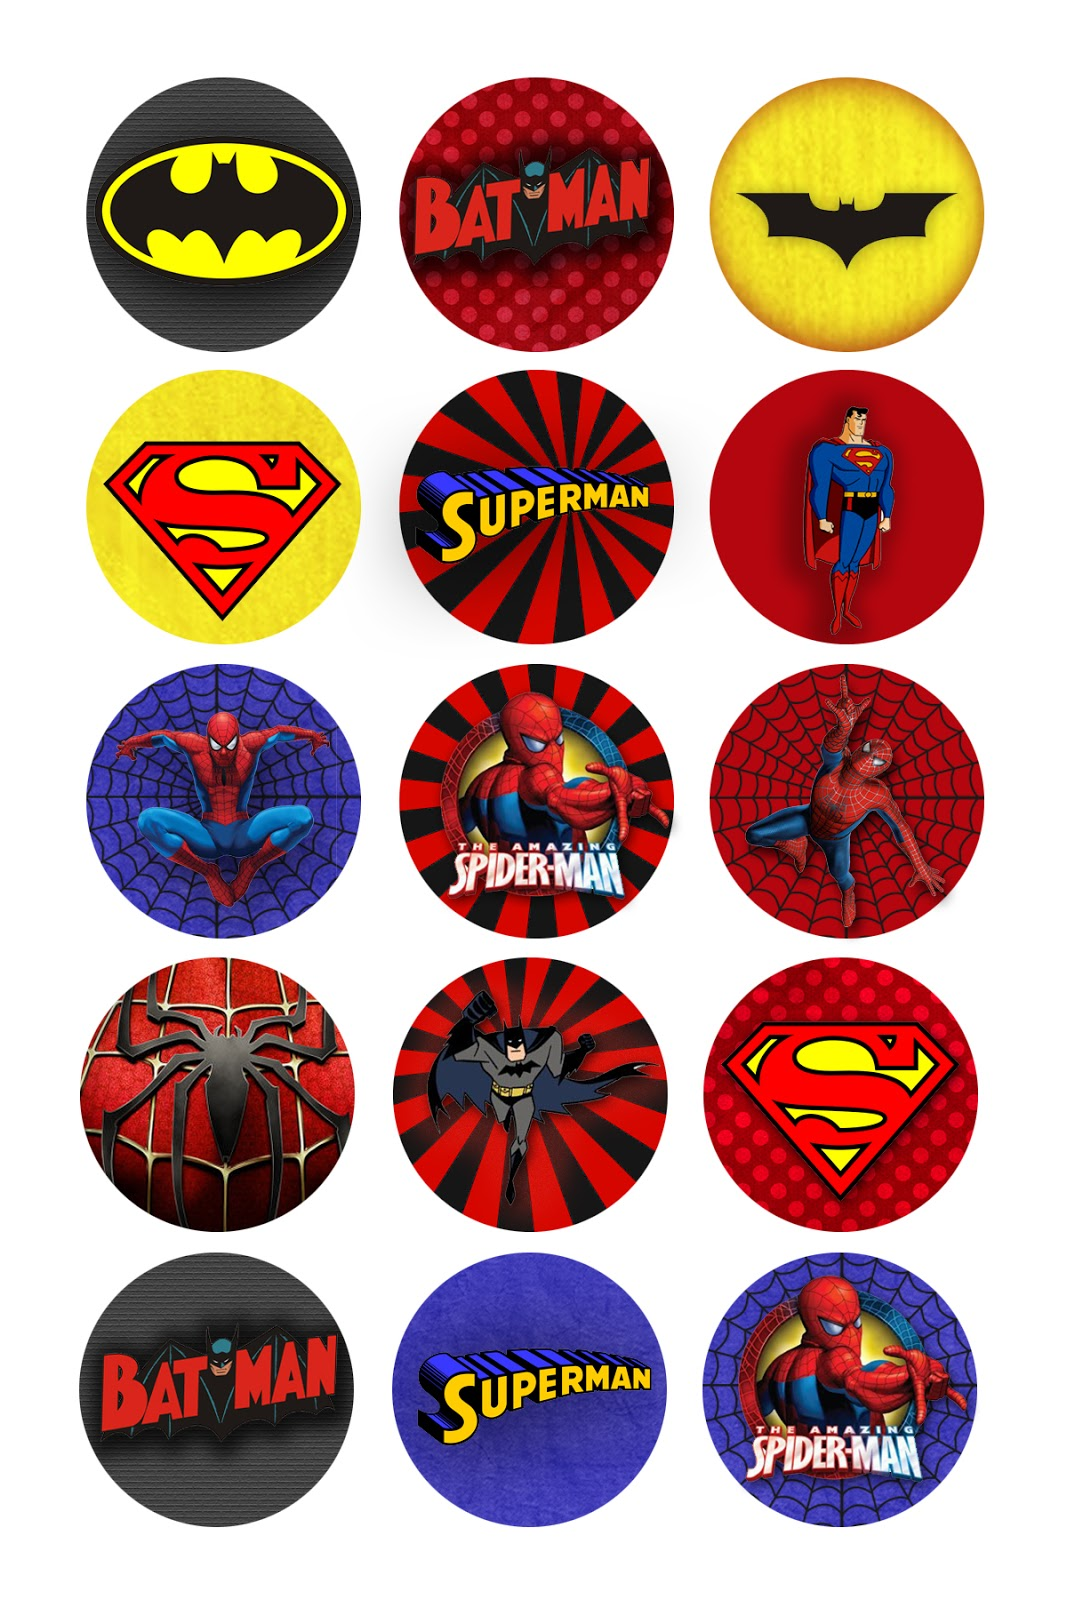 Super Heroes Etiquetas O Toppers Para Imprimir Gratis